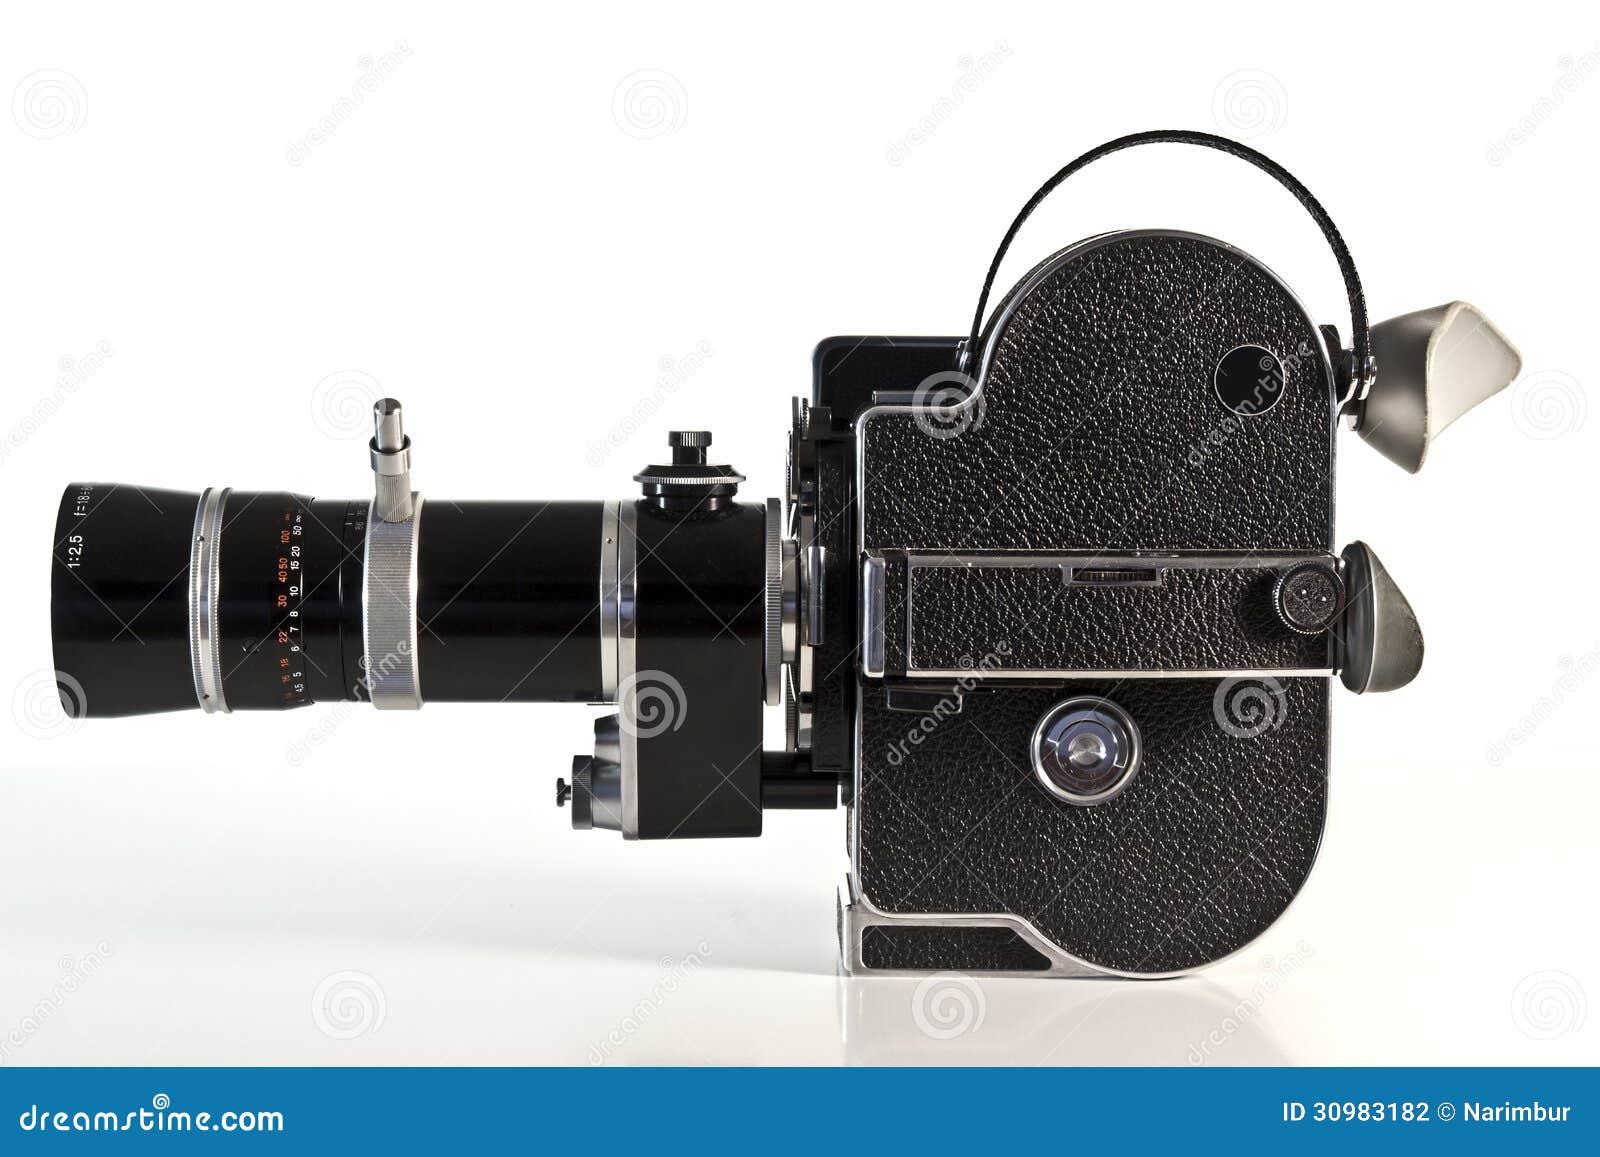 Camera Scanning